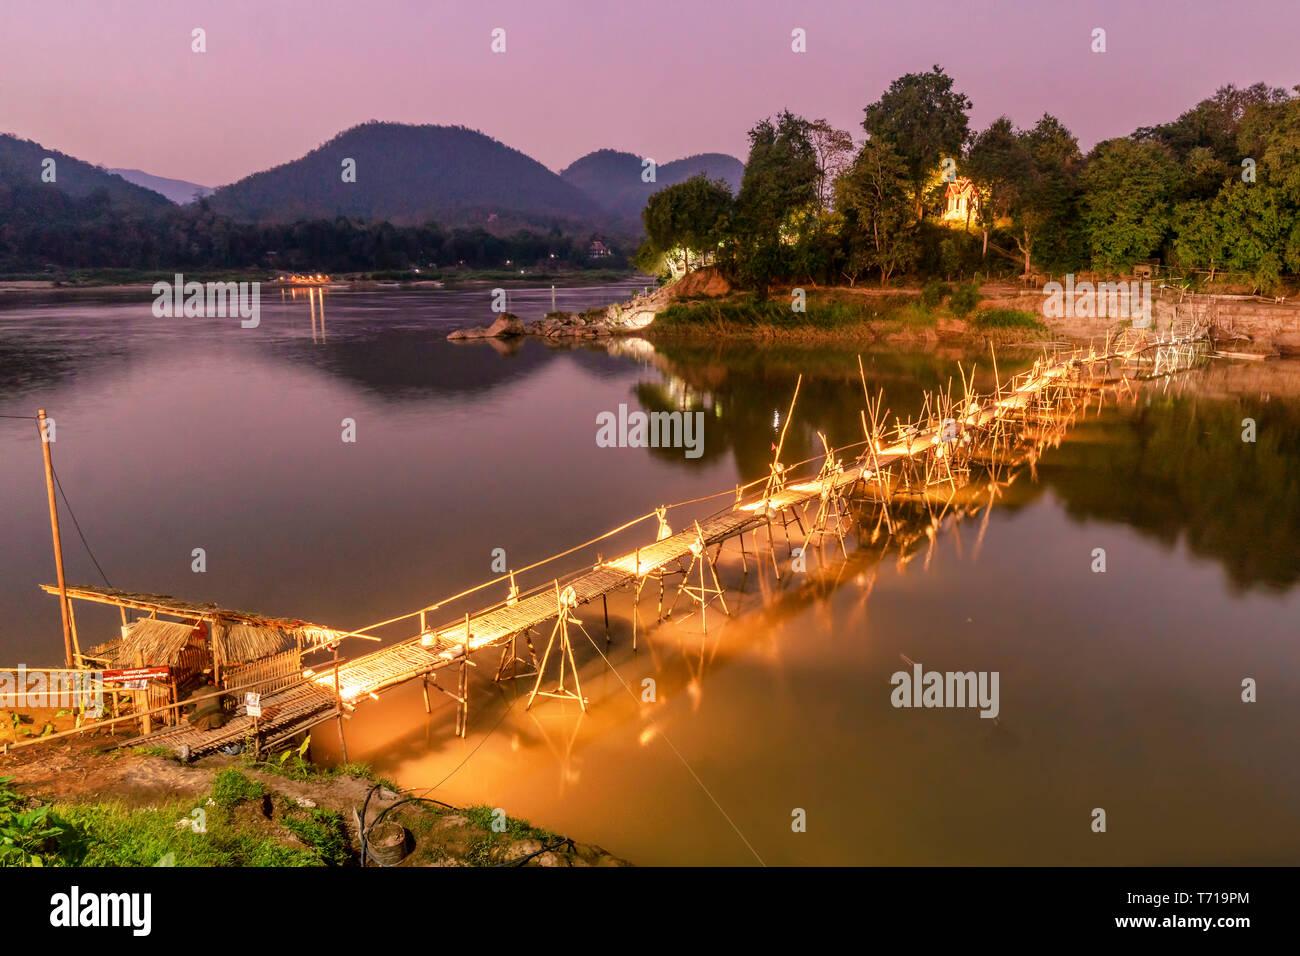 Bamboo bridge , Mekong river, Luang Prabang, Laos Stock Photo